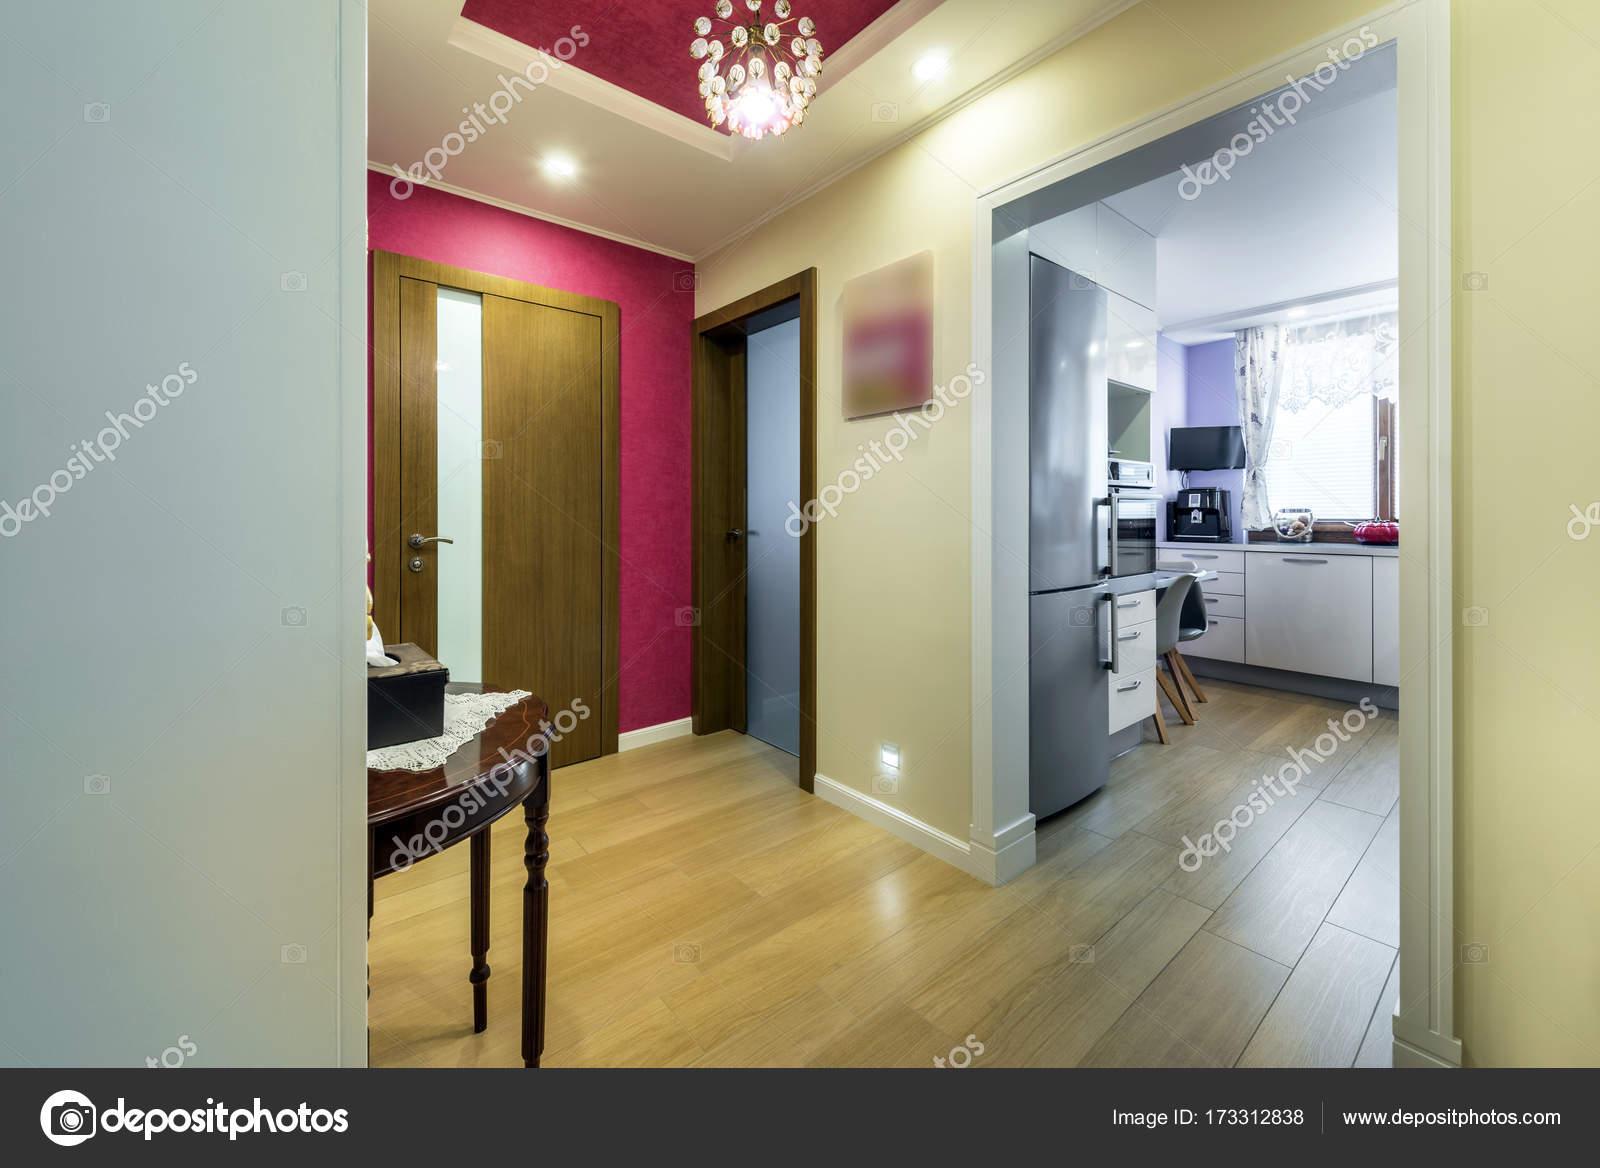 Modernes Haus im retro-Stil — Stockfoto © jacek_kadaj #173312838